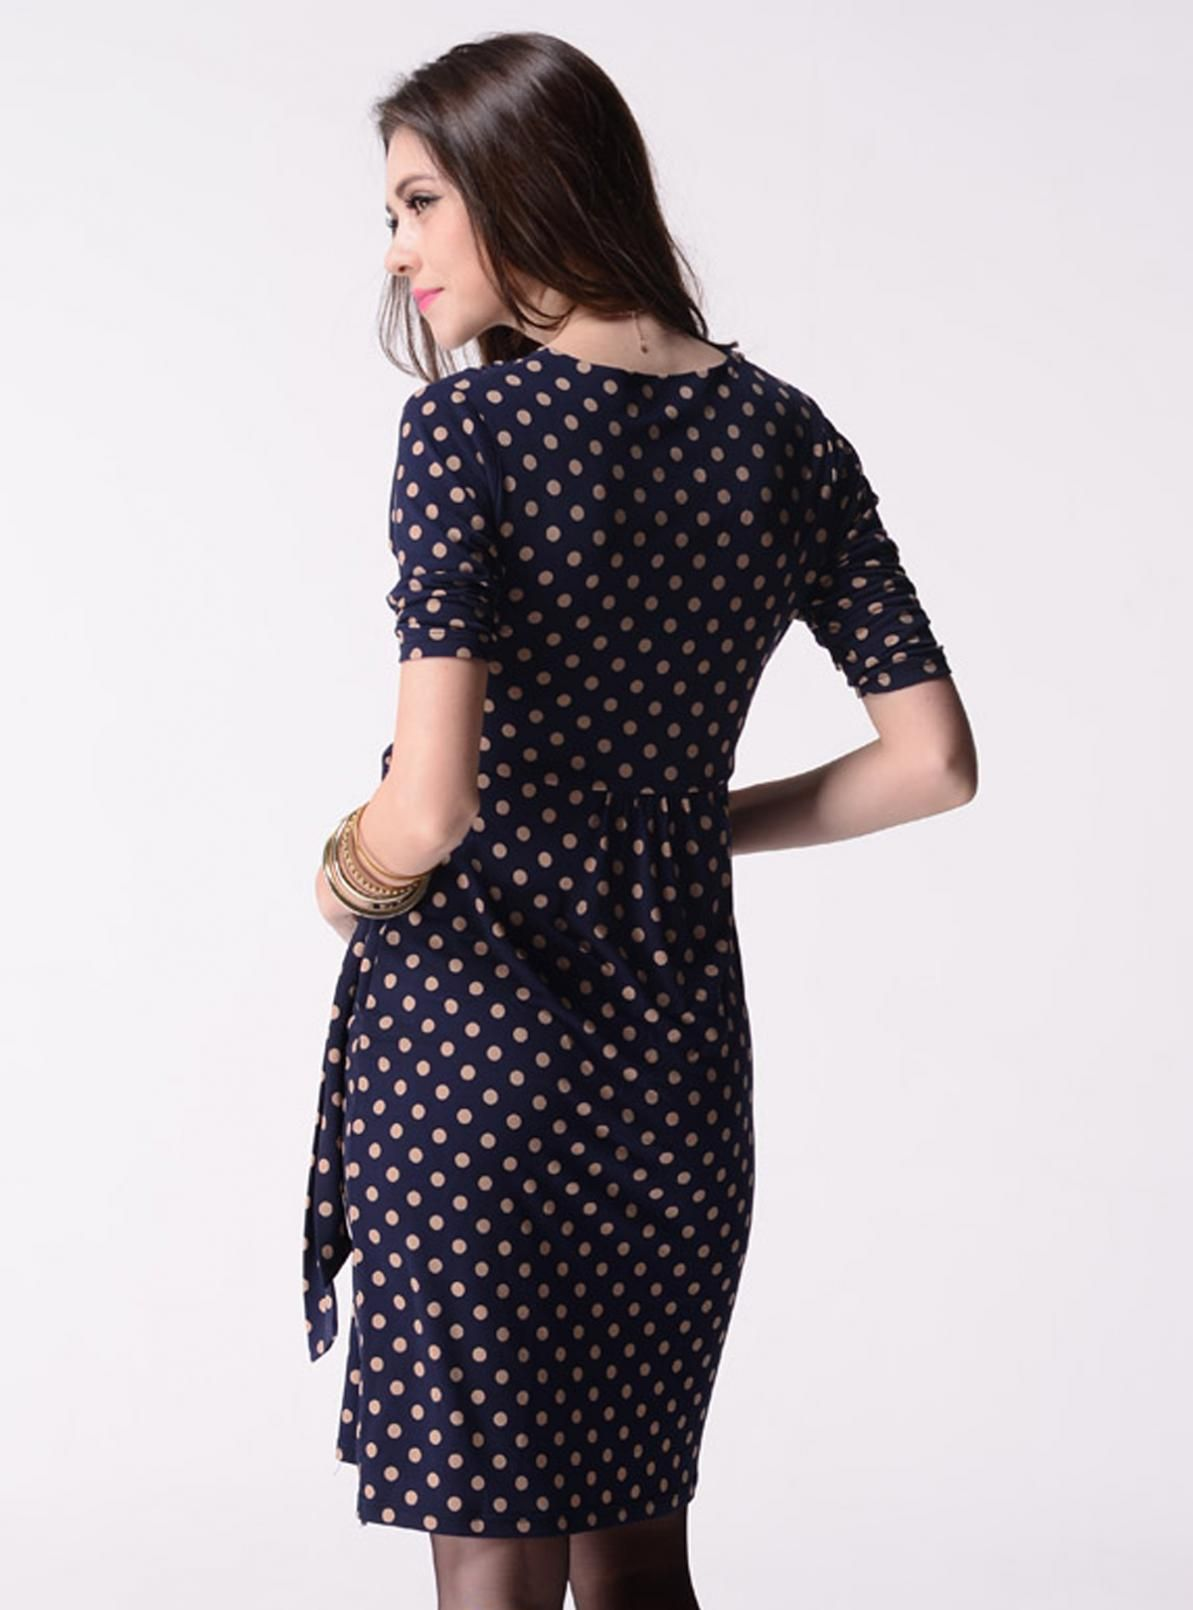 Maternity u nursing sleeve wrap dress in polka dot small only